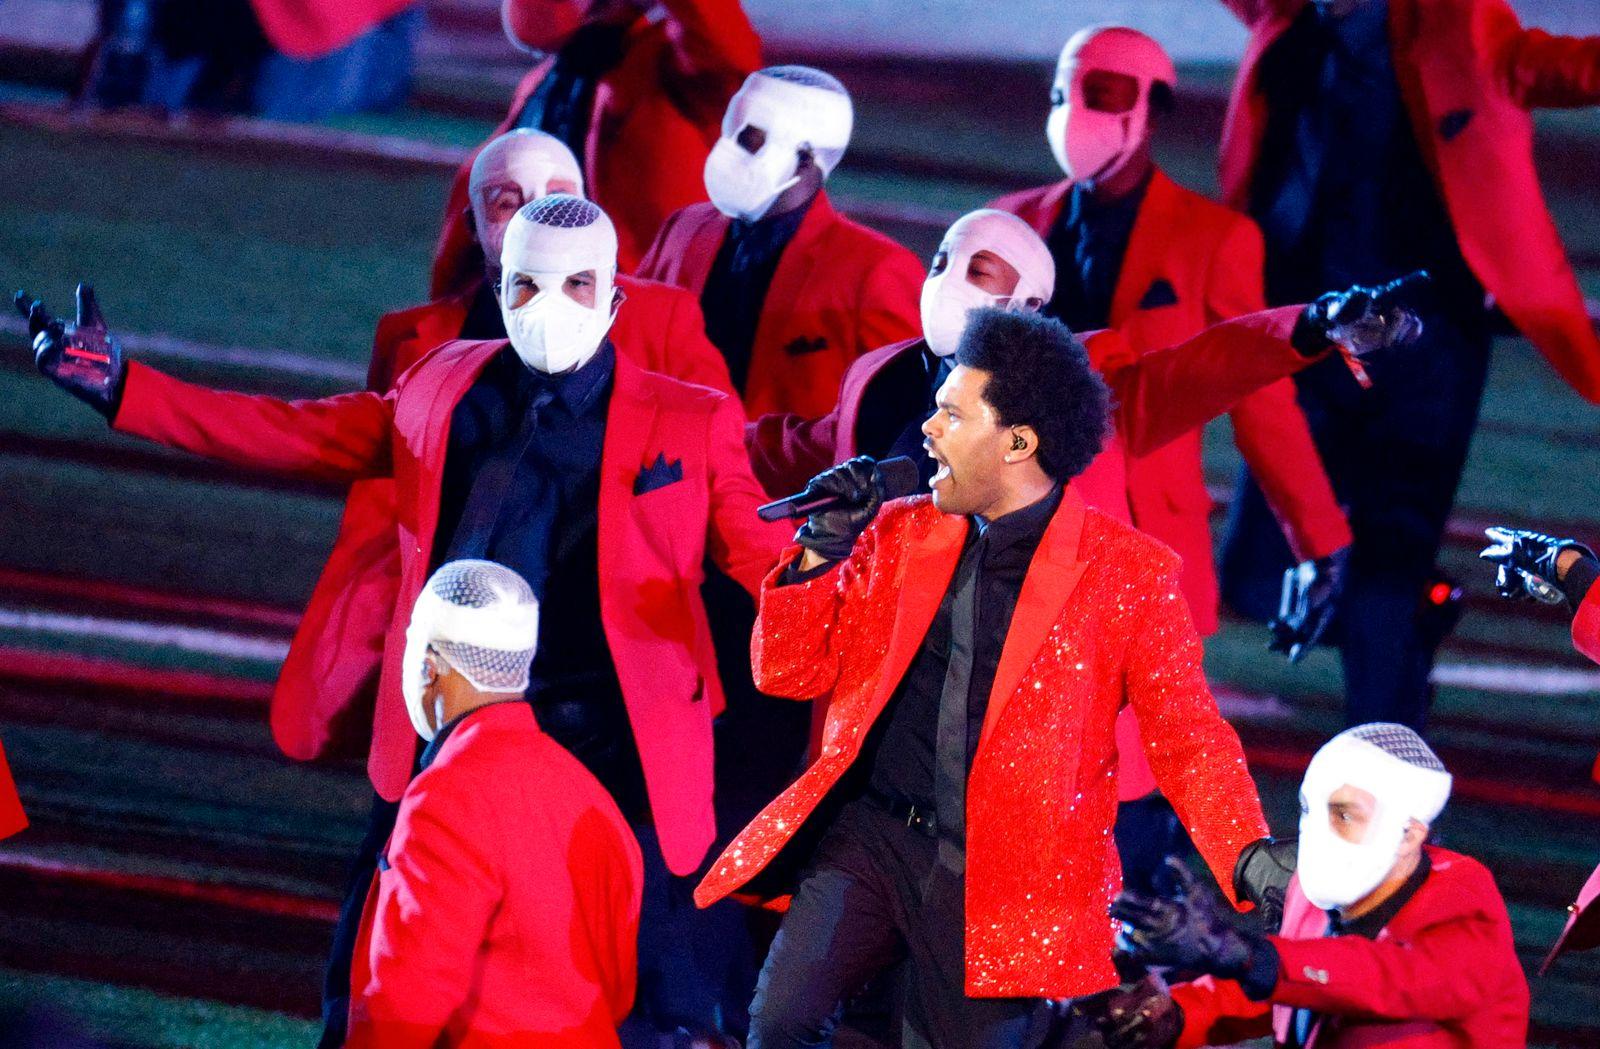 Super Bowl LV Halftime Show - Tampa Bay Buccaneers v Kansas City Chiefs